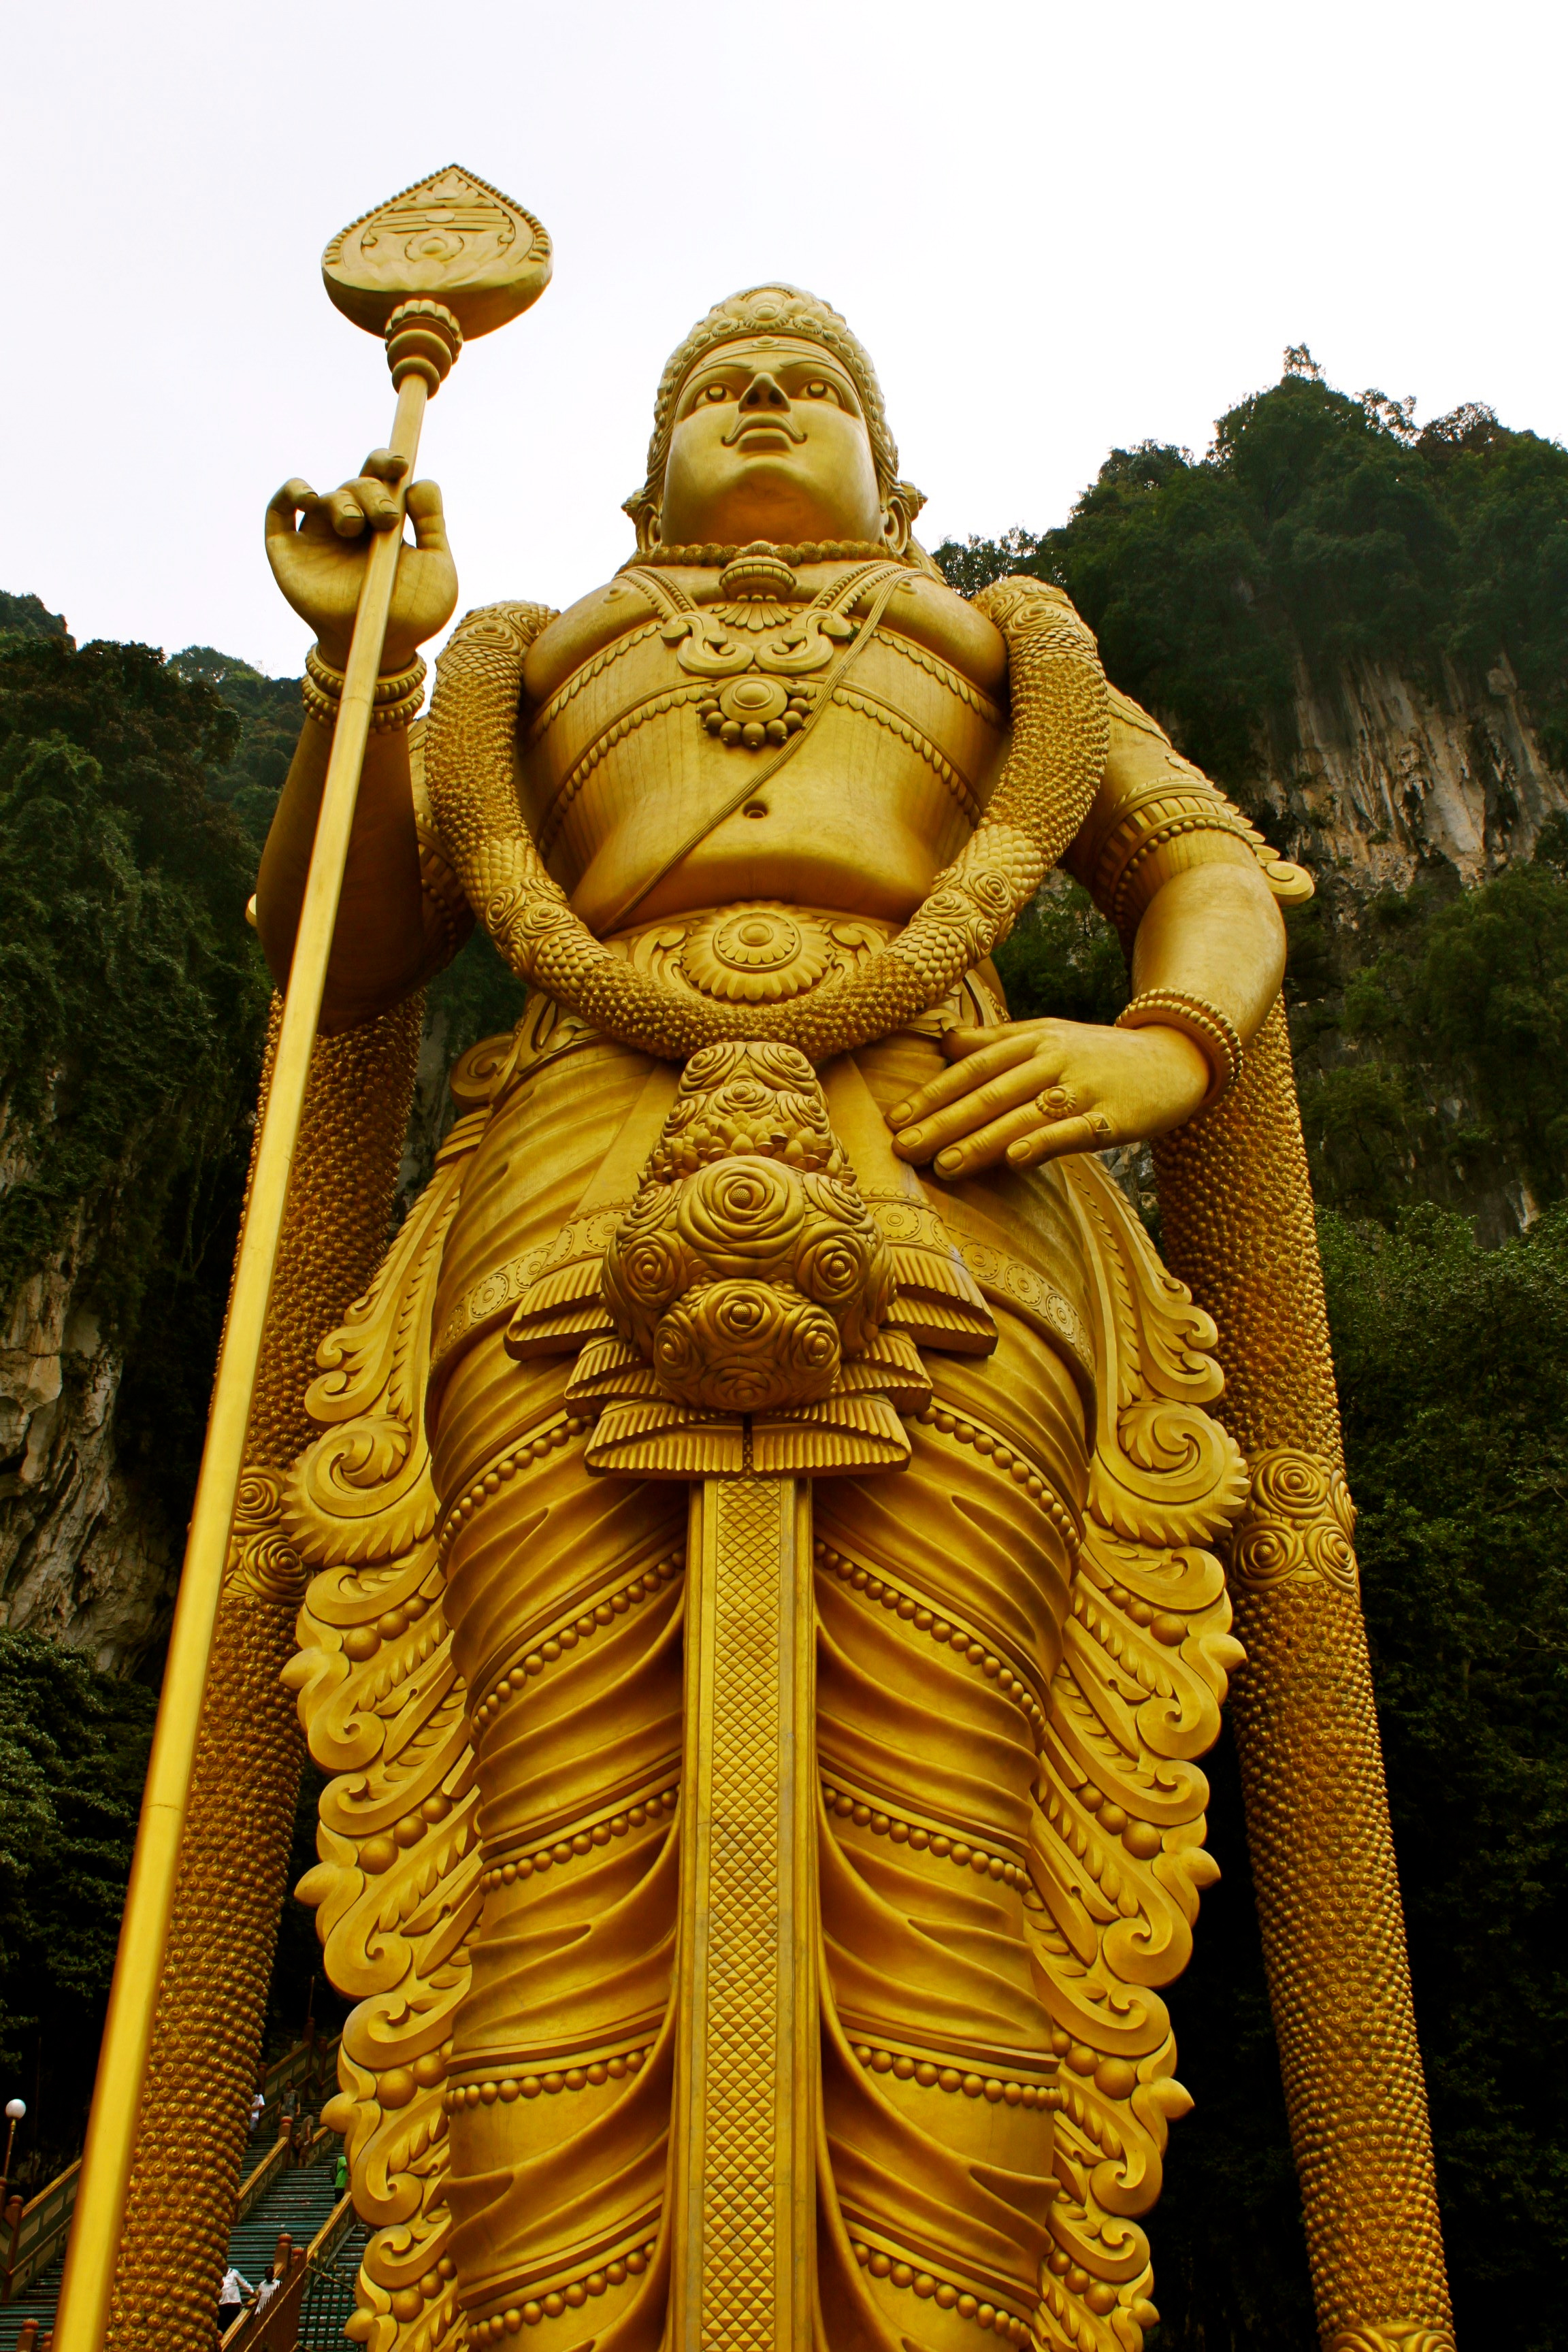 Lord Murugan Kuala Lumpur batu Caves malaysia